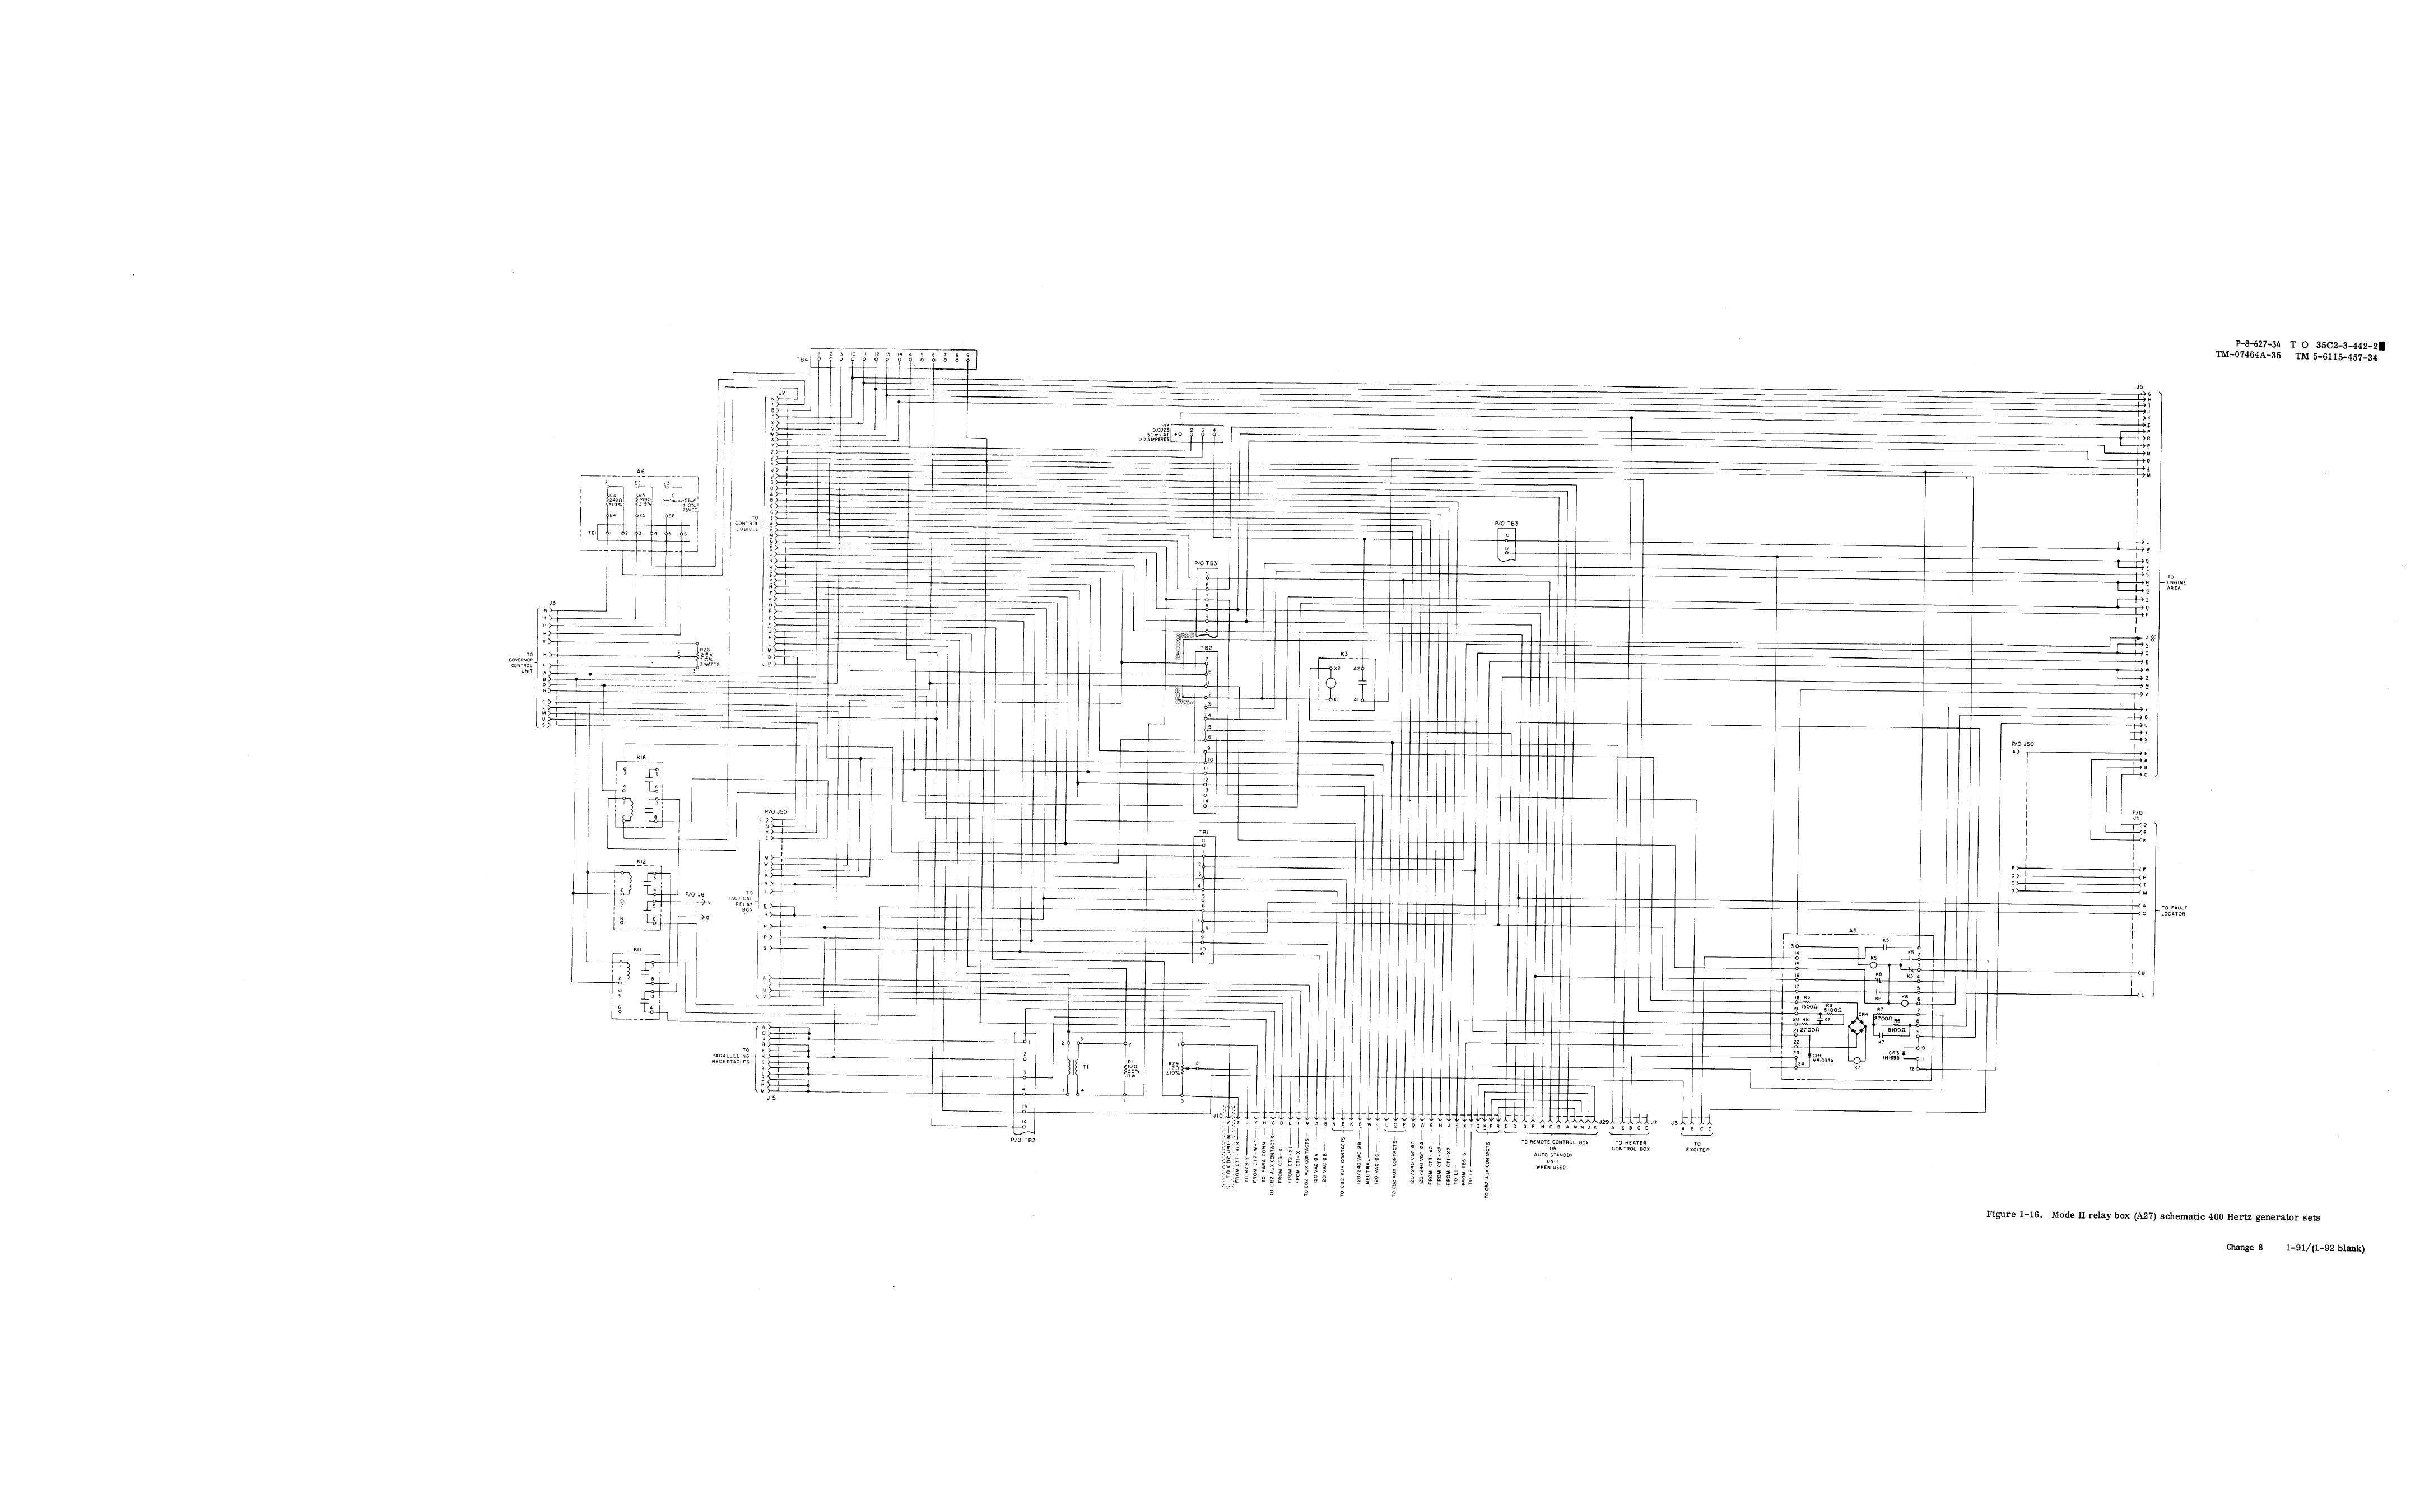 Figure 1 16 Mode Ii Relay Box A27 Schematic 400 Hertz